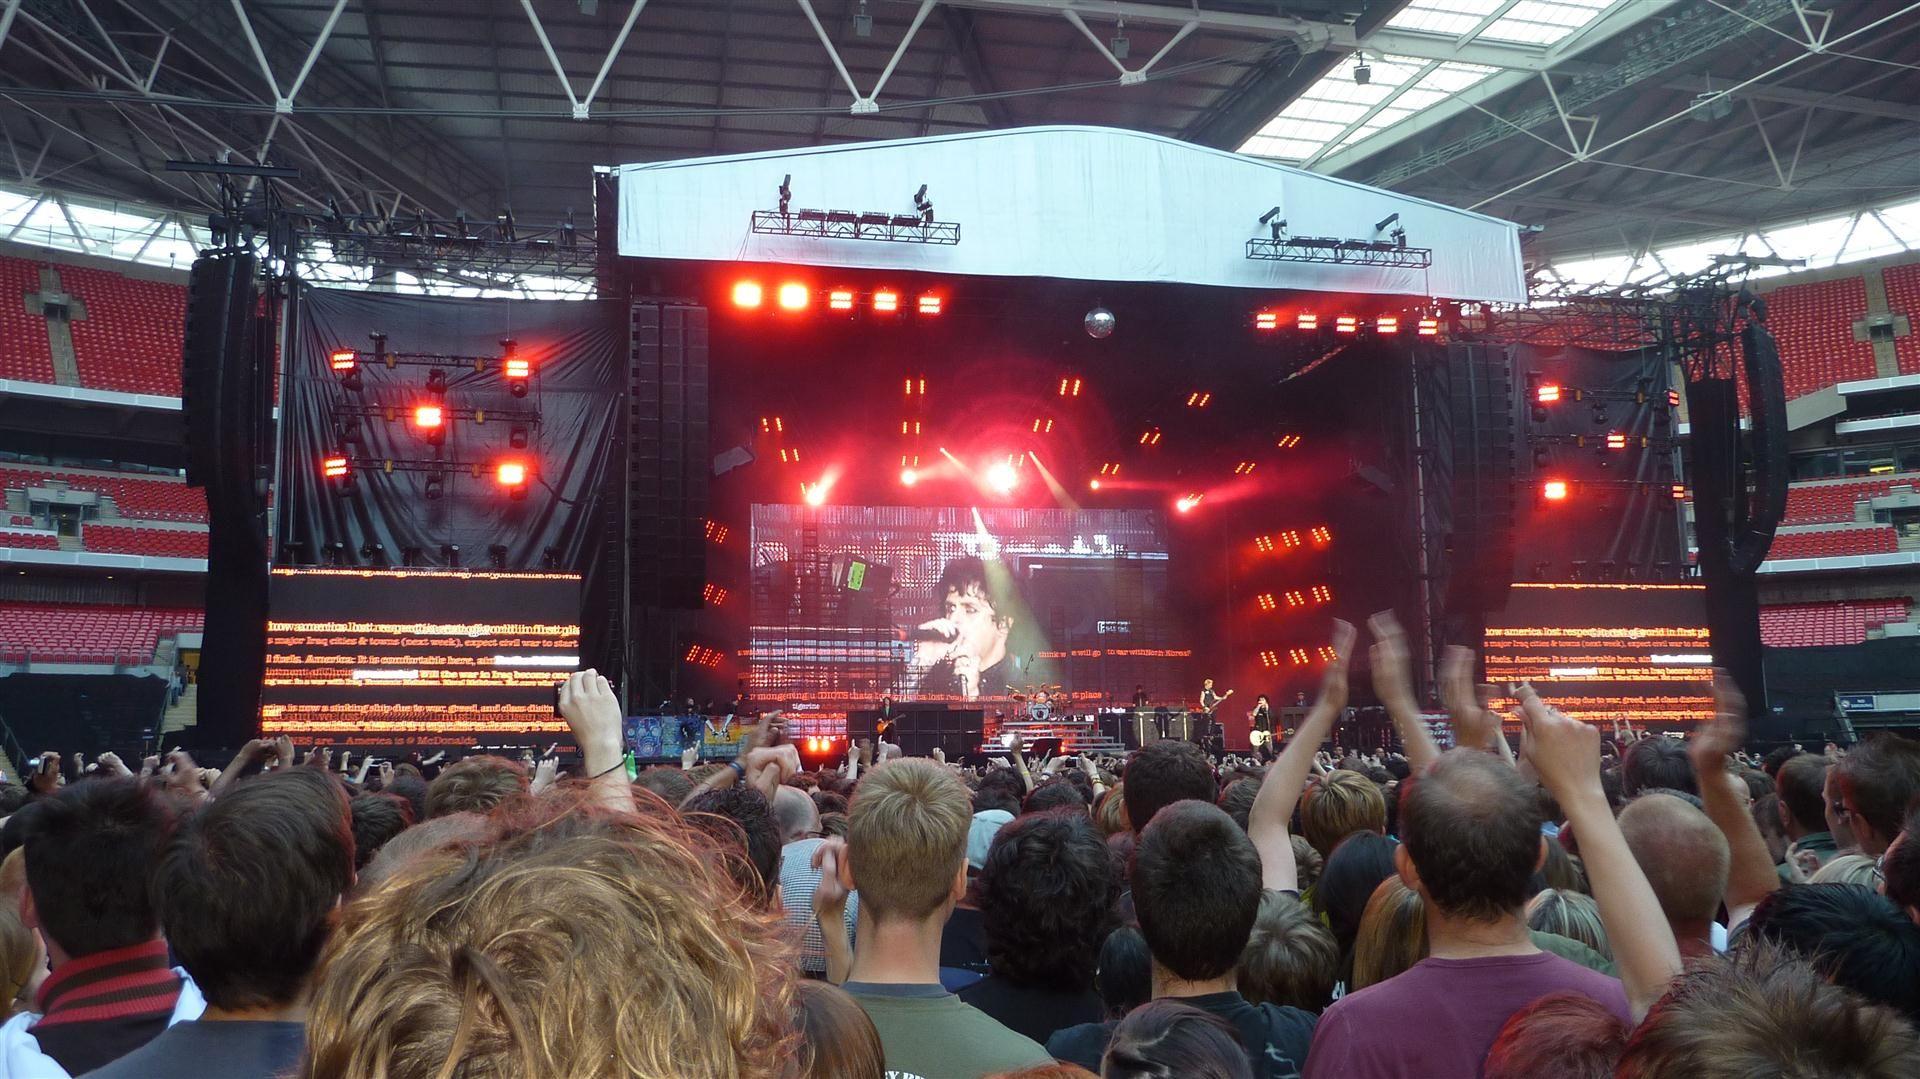 Wembley June 2010...I was there fantastic !!!